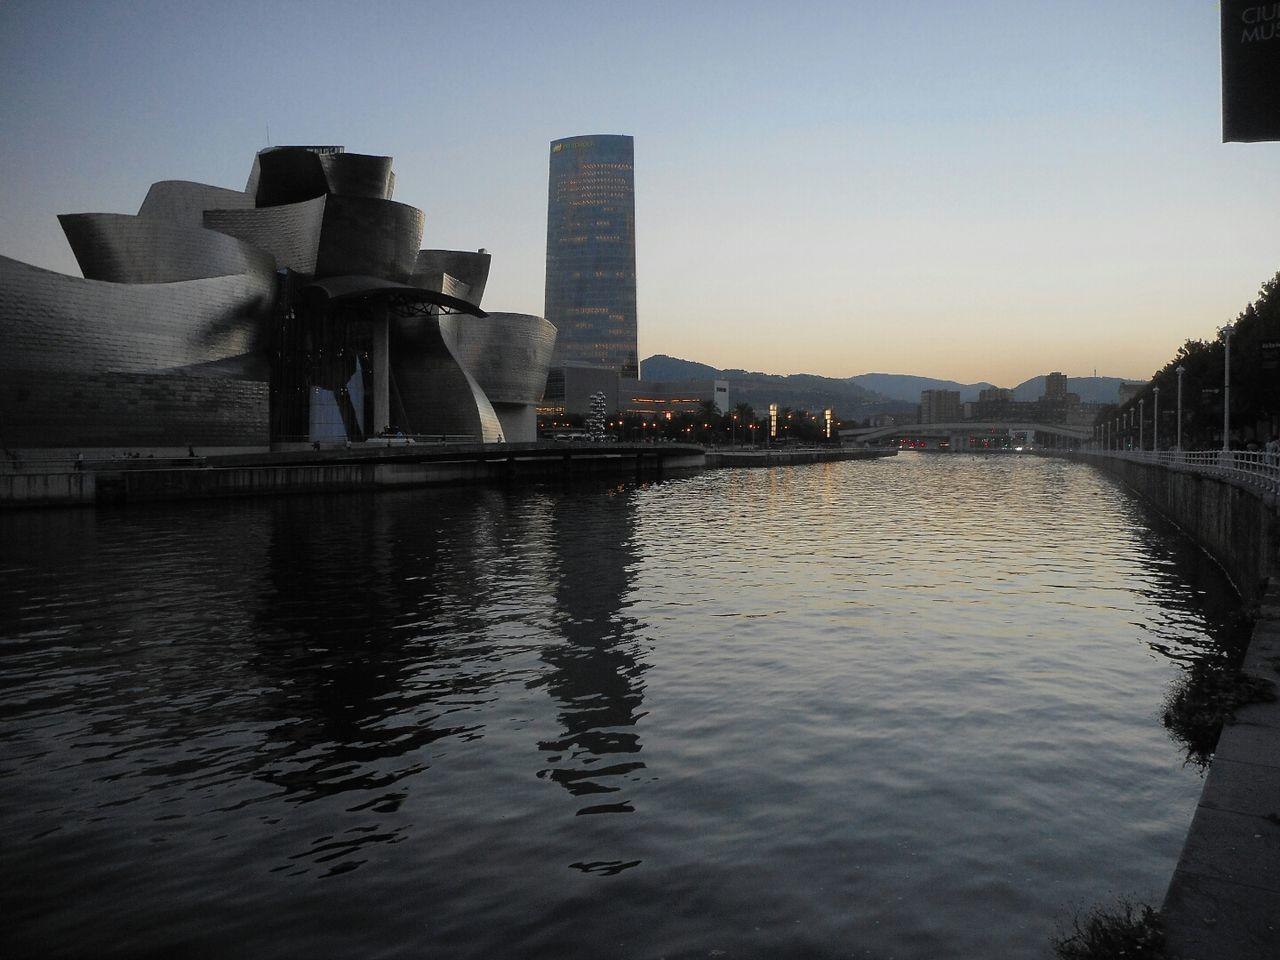 Bilbao at sunset Bilbao Bilbaolovers Building Exterior Water Waterfront Built Structure Urban Scene City Life Architecture Guggenheim Bilbao Sunset